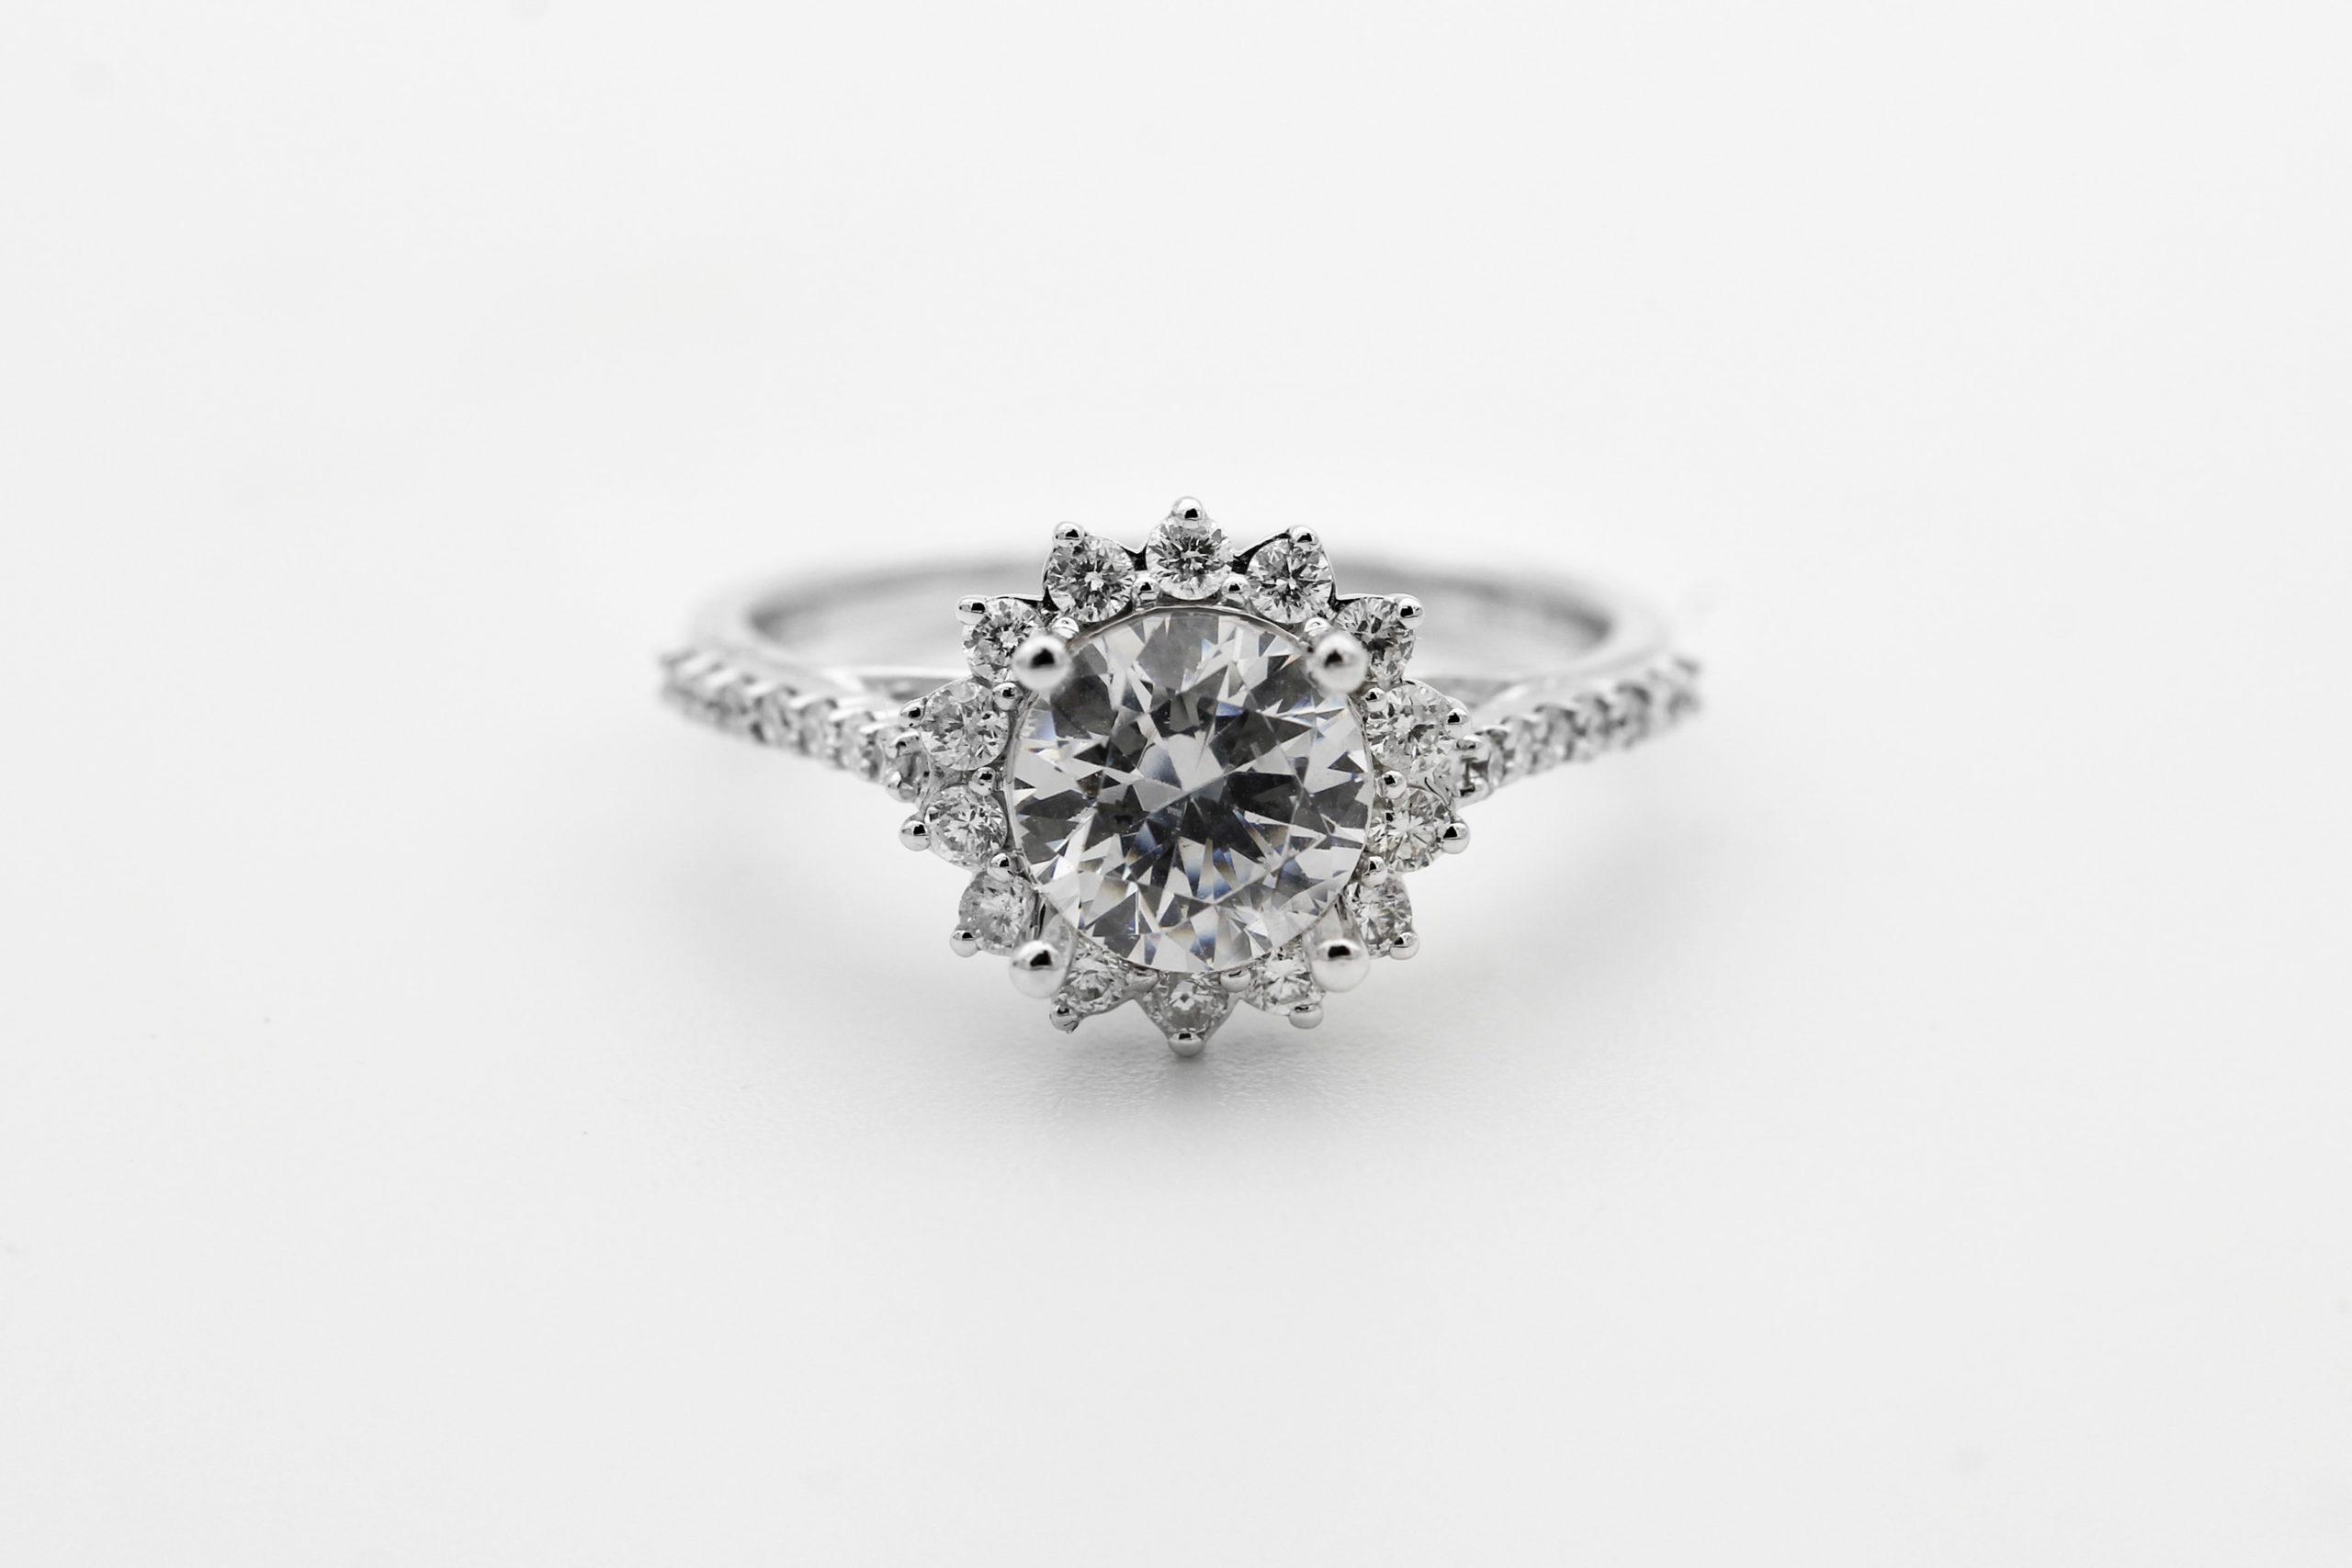 Certification of diamonds